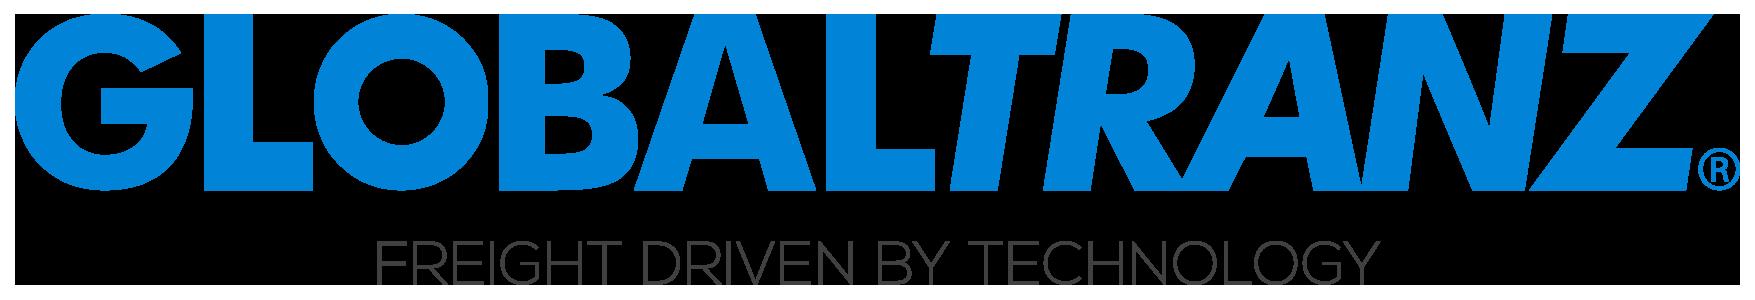 GTZ-Slogan-Logo-2014.png